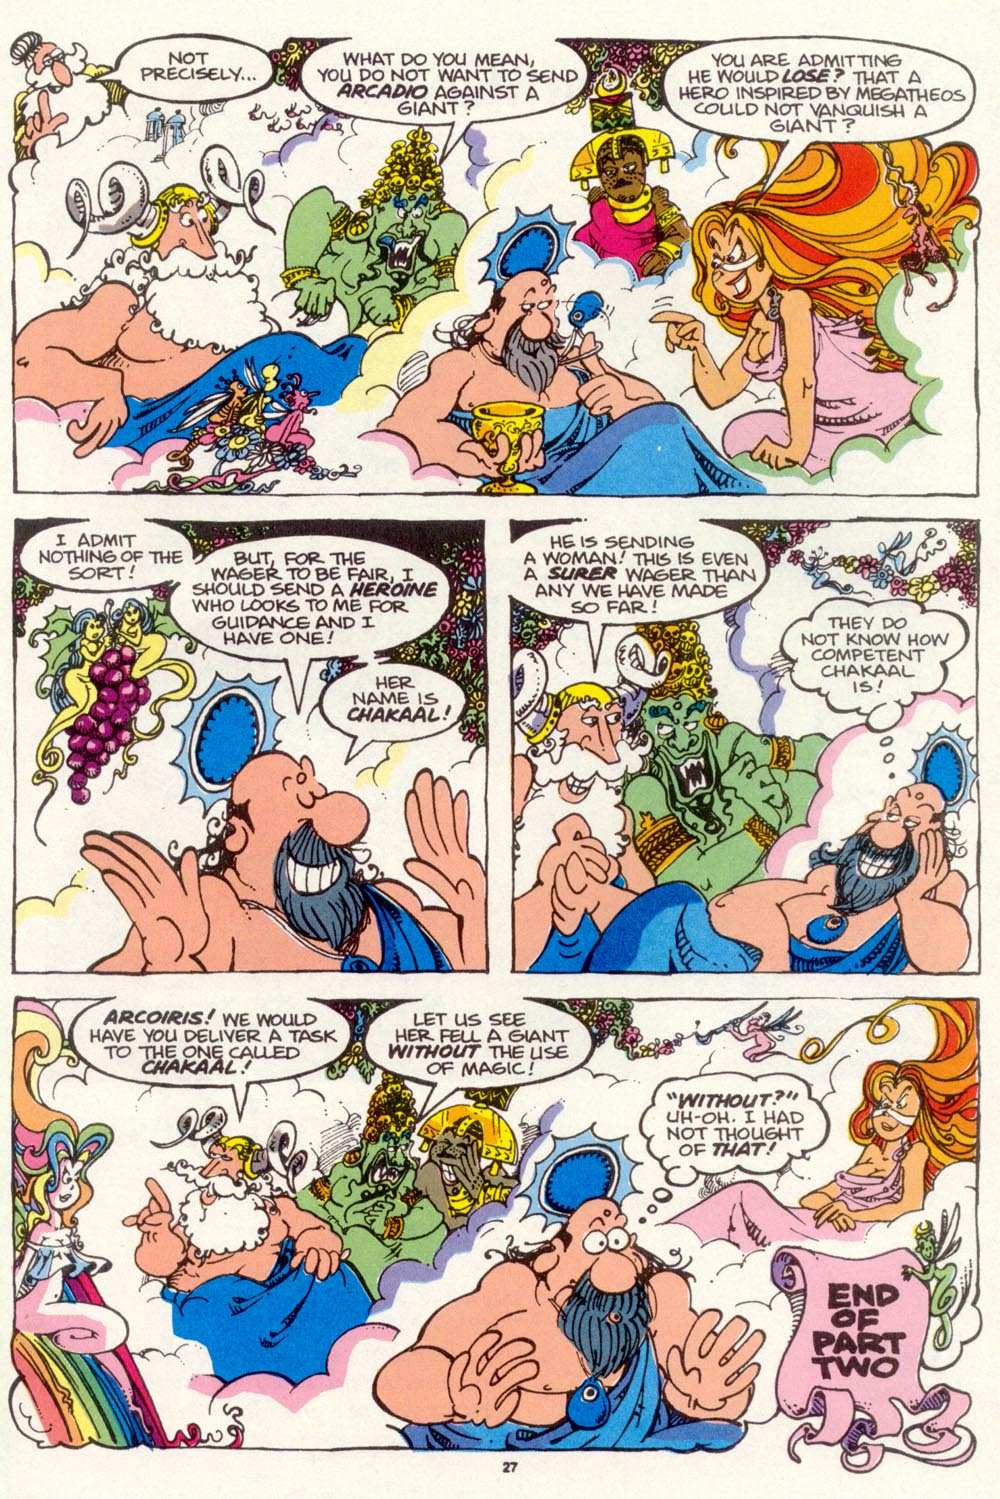 Read online Sergio Aragonés Groo the Wanderer comic -  Issue #97 - 28